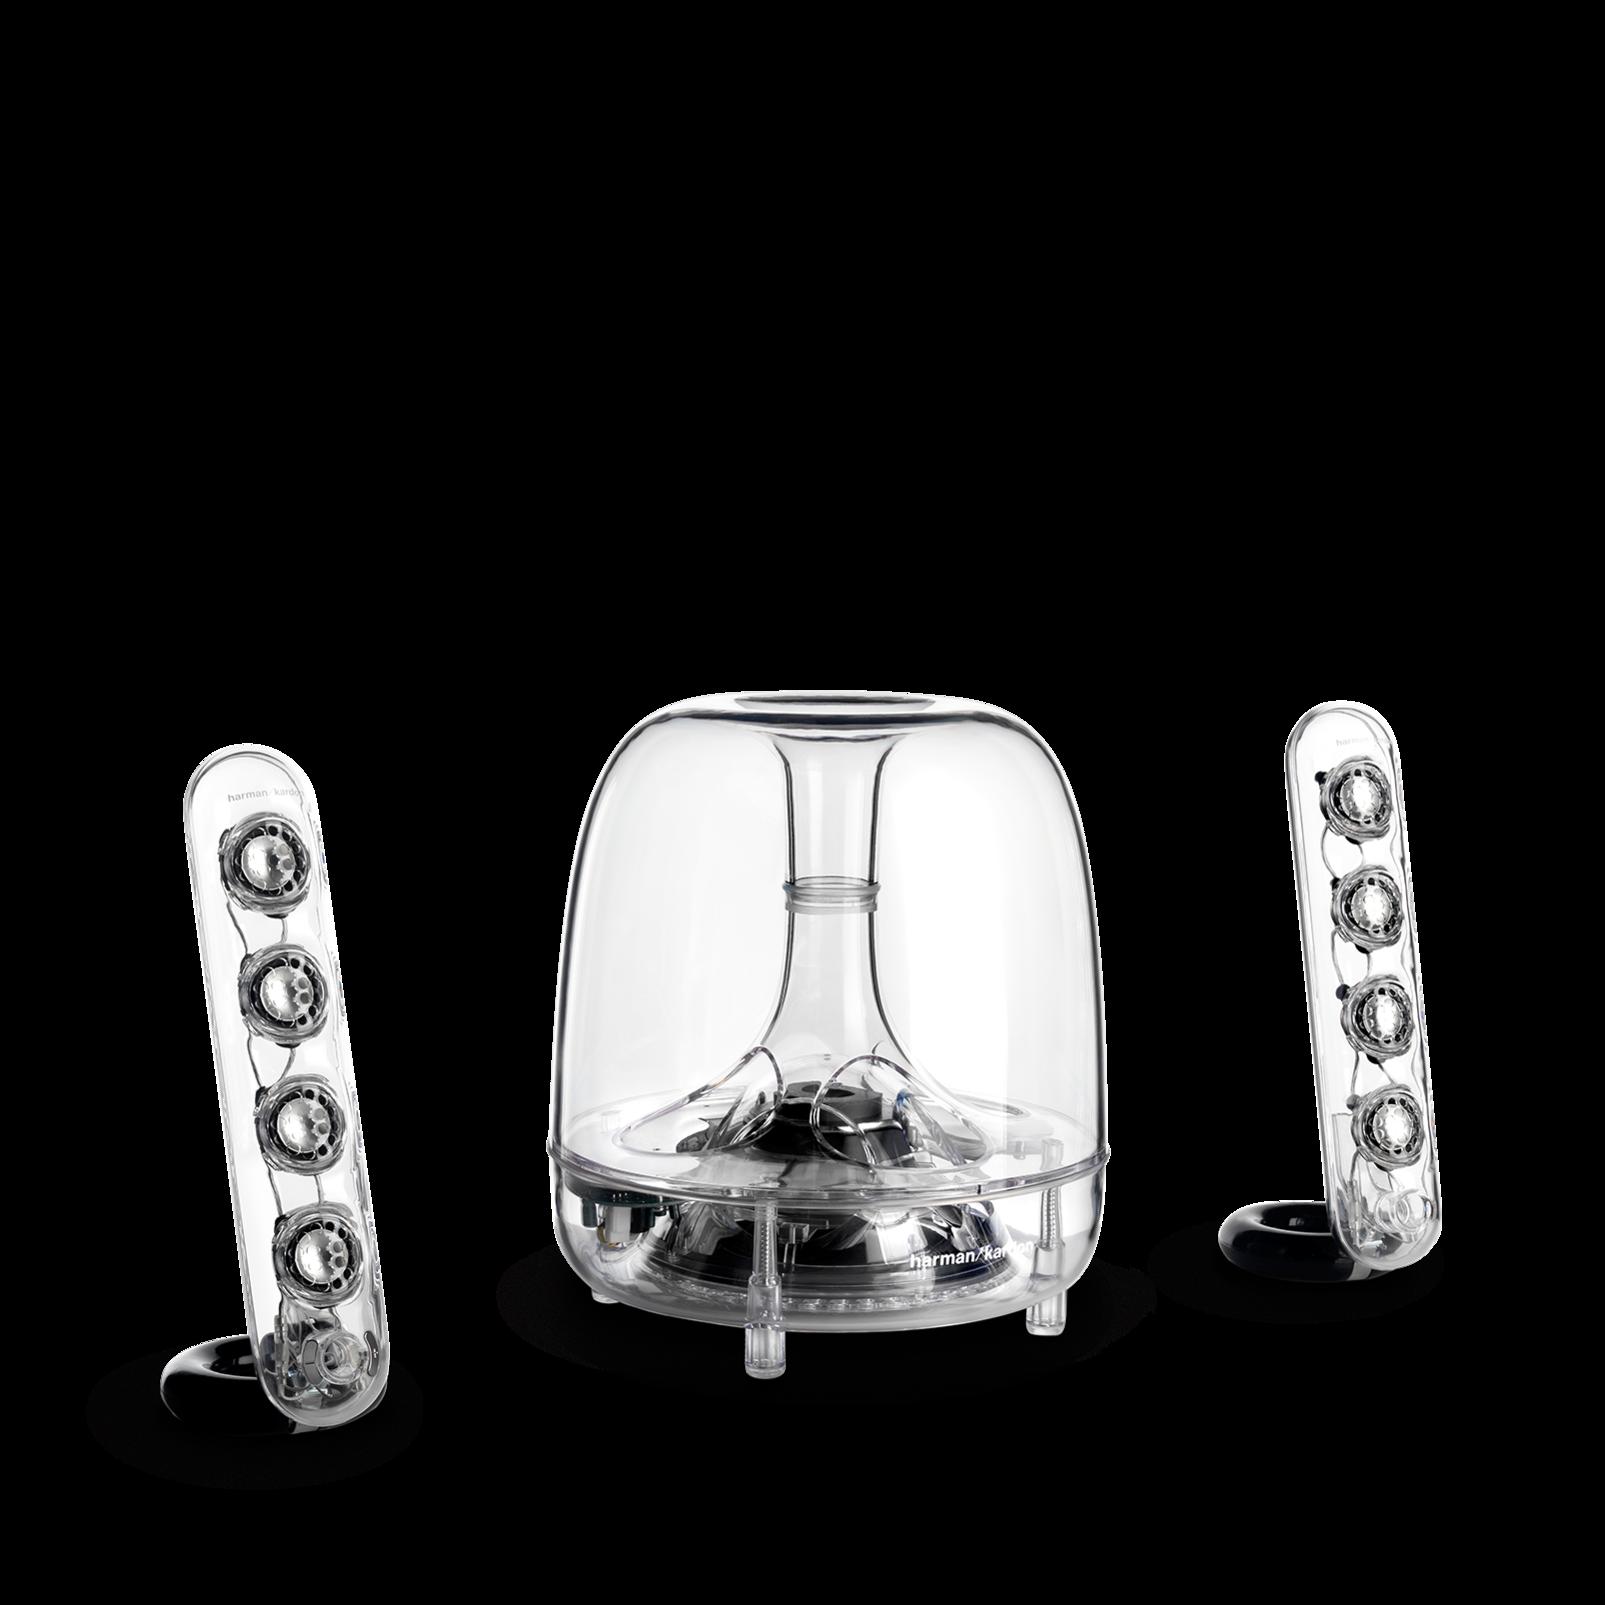 SoundSticks III - Clear - Three-piece, 2.1-channel multimedia sound system - Detailshot 4